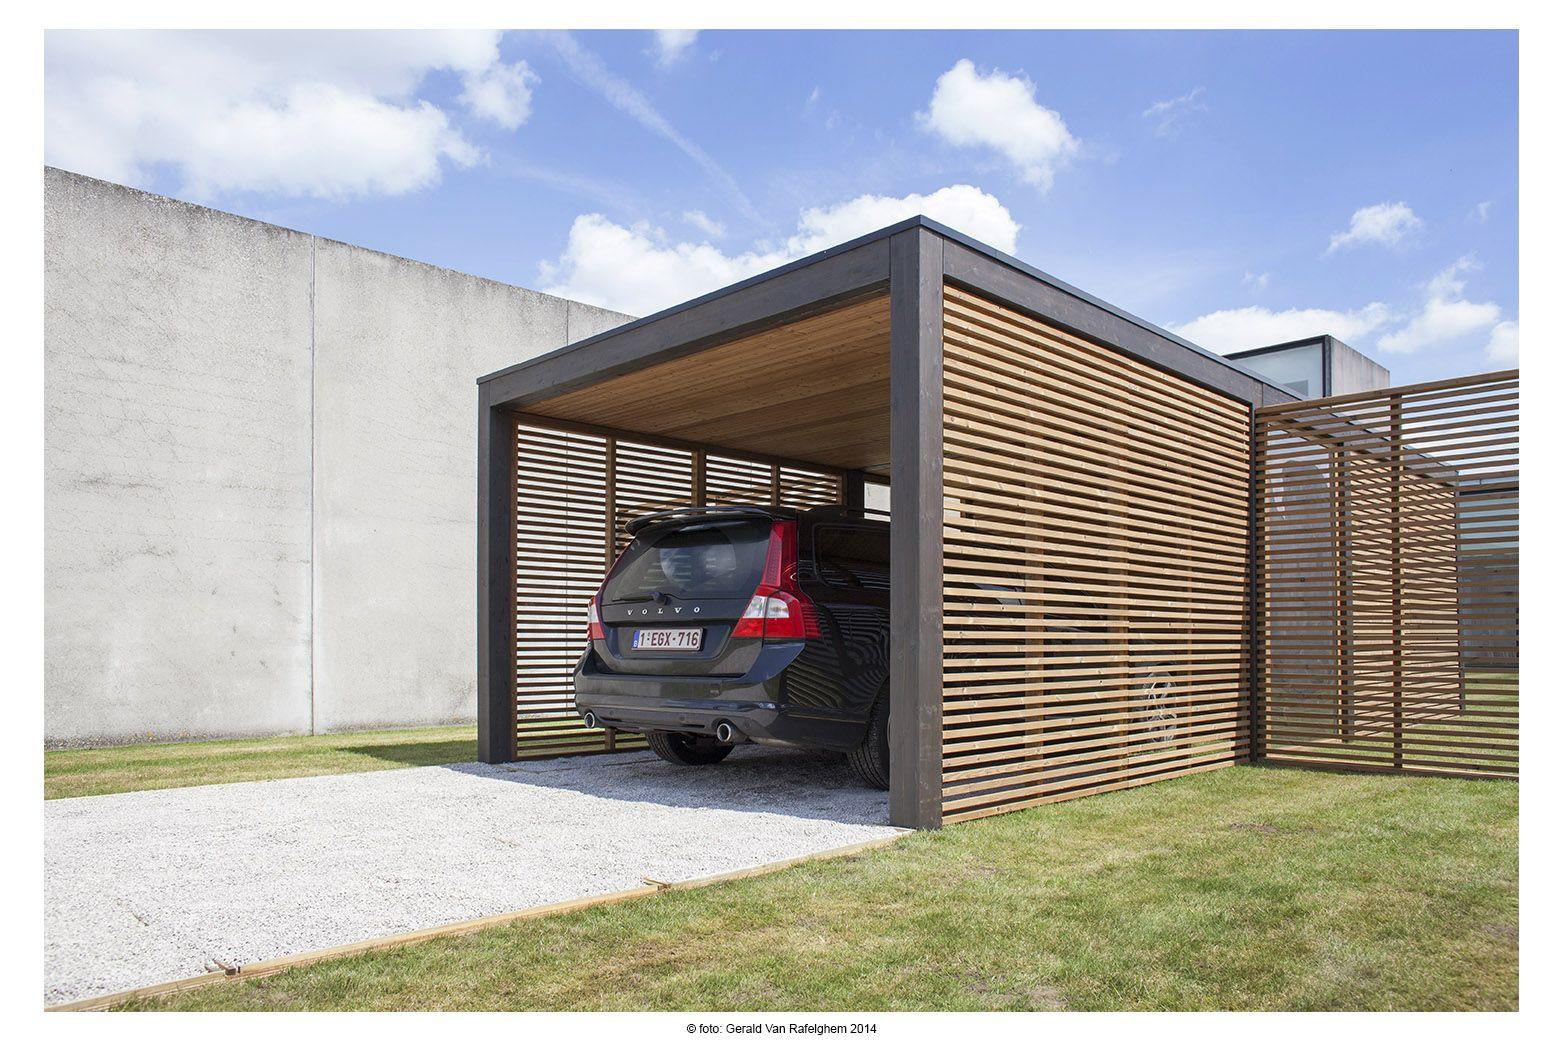 collstrop modu architecture pinterest garage ideas carport ideas and pergolas. Black Bedroom Furniture Sets. Home Design Ideas